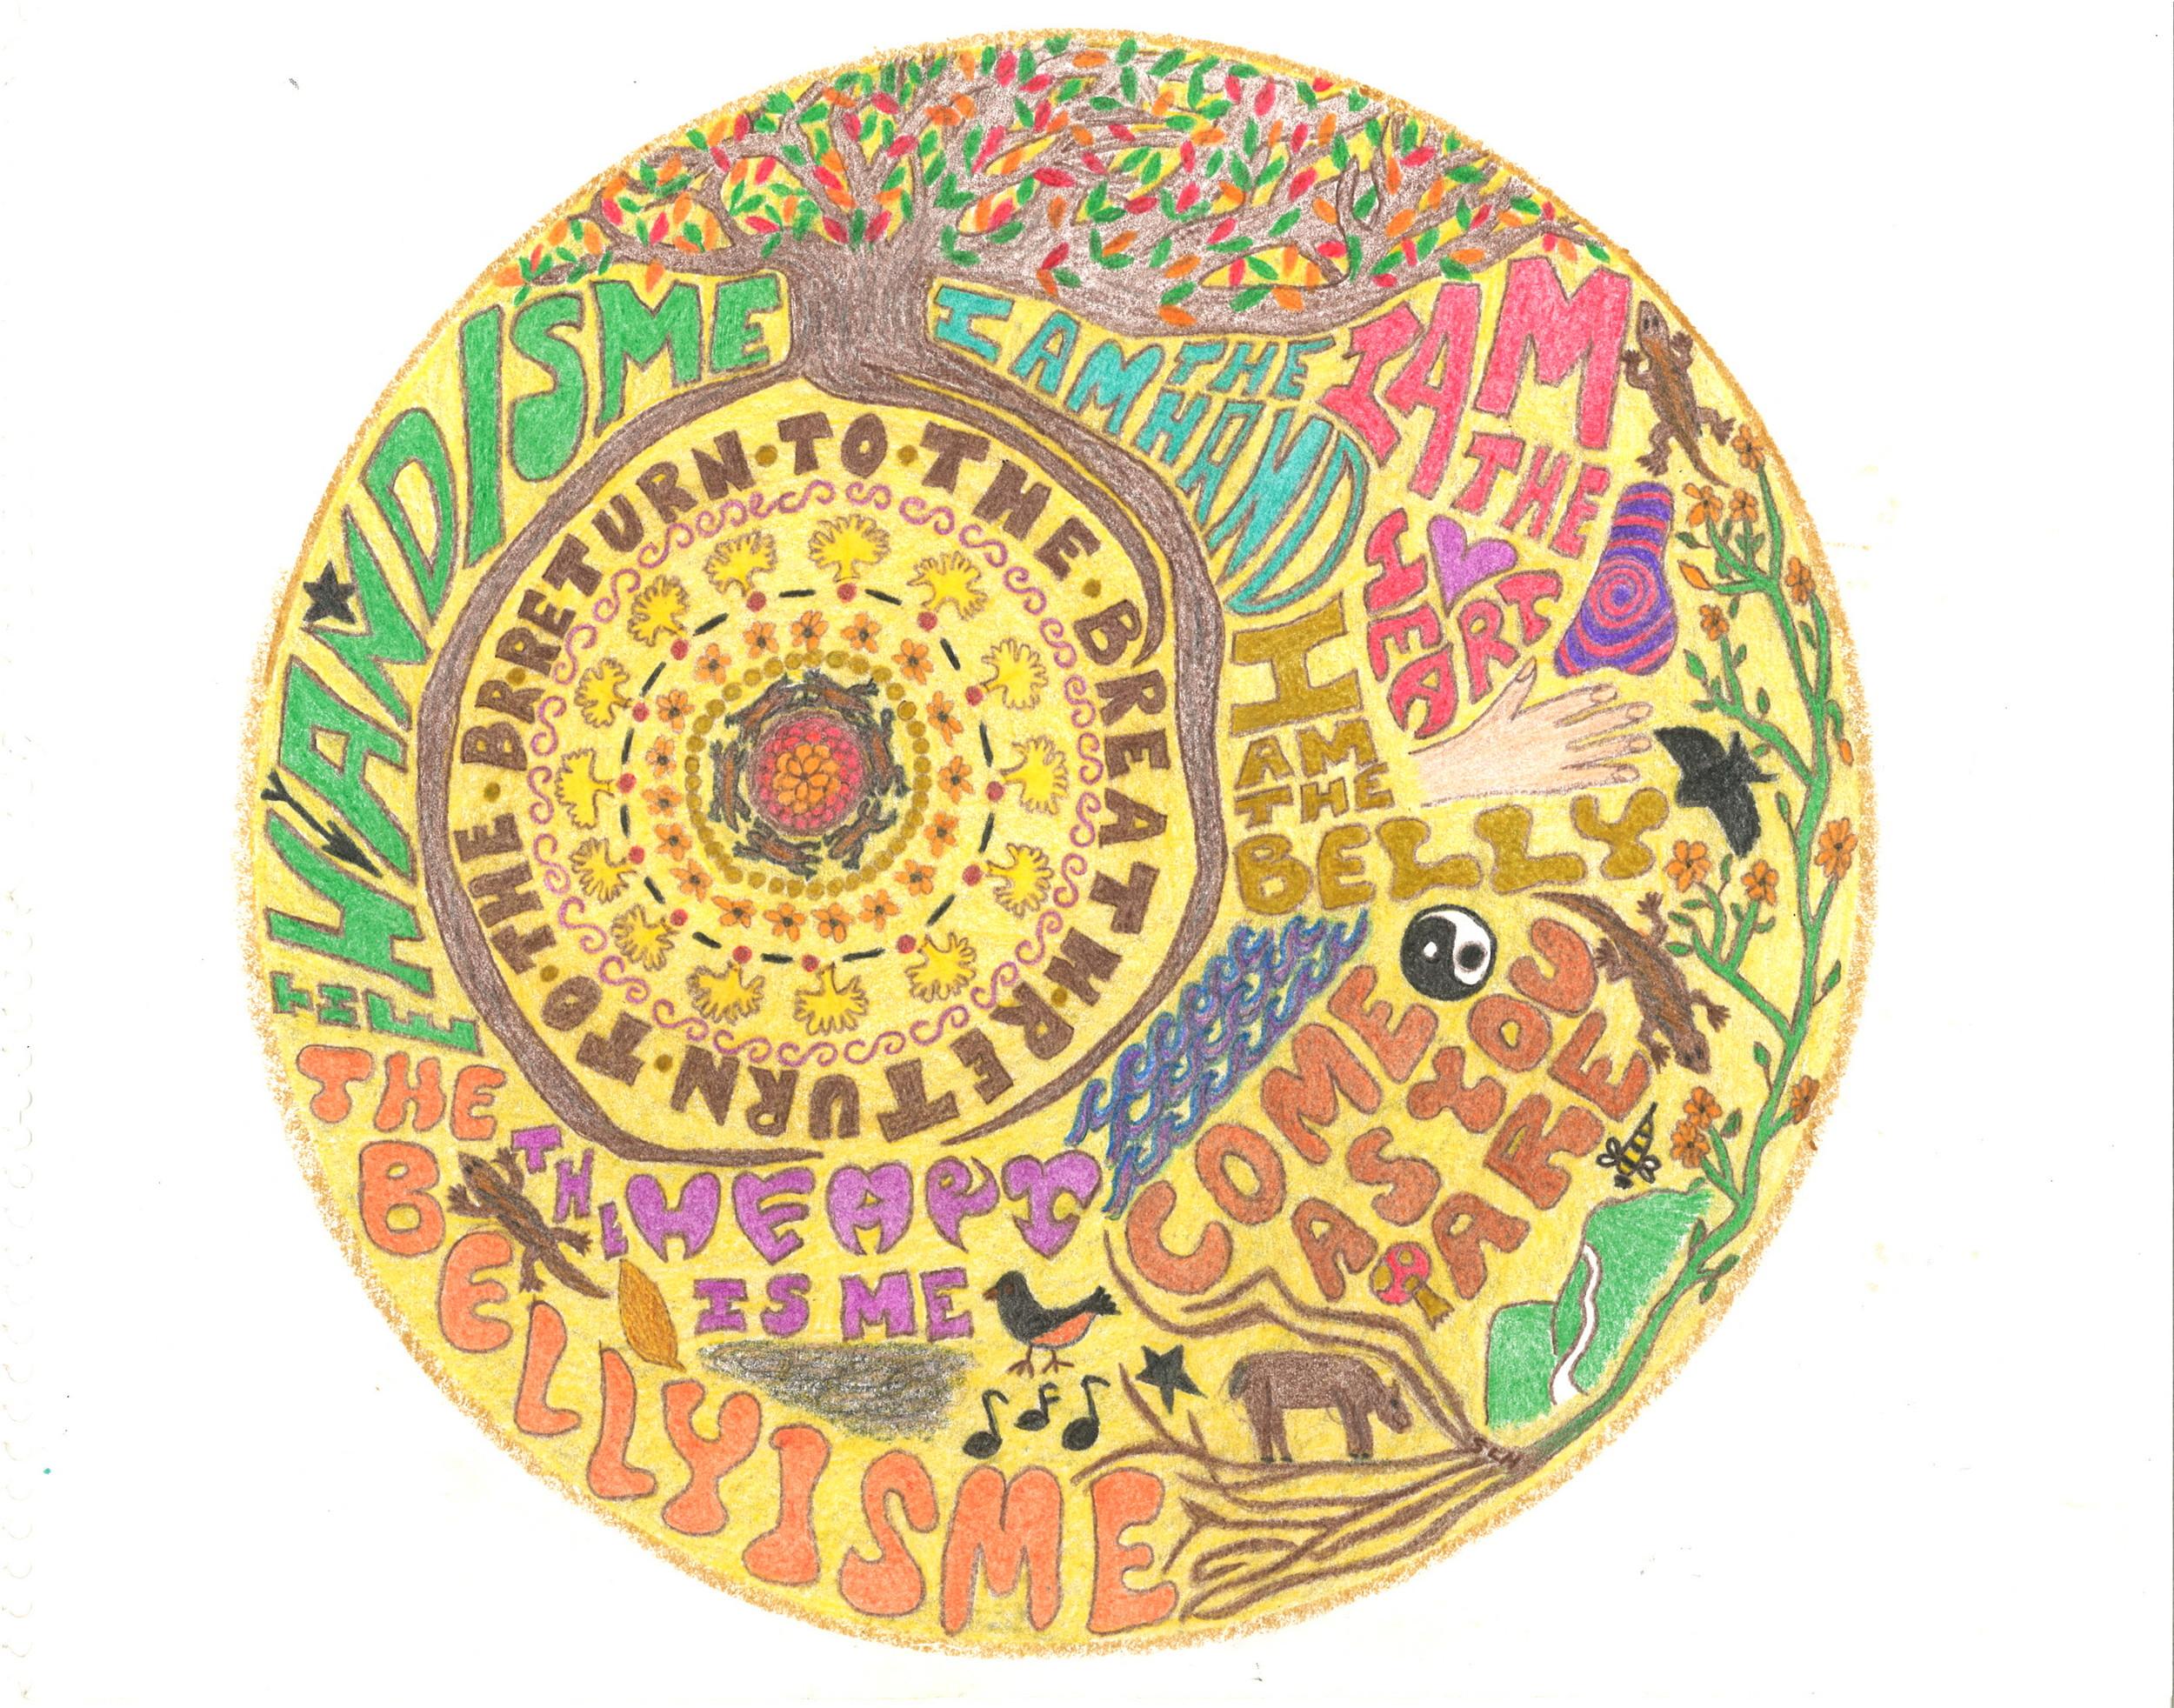 Mandala drawing by Sherry Hamby,Power of Presence Women's Retreat, September 2015